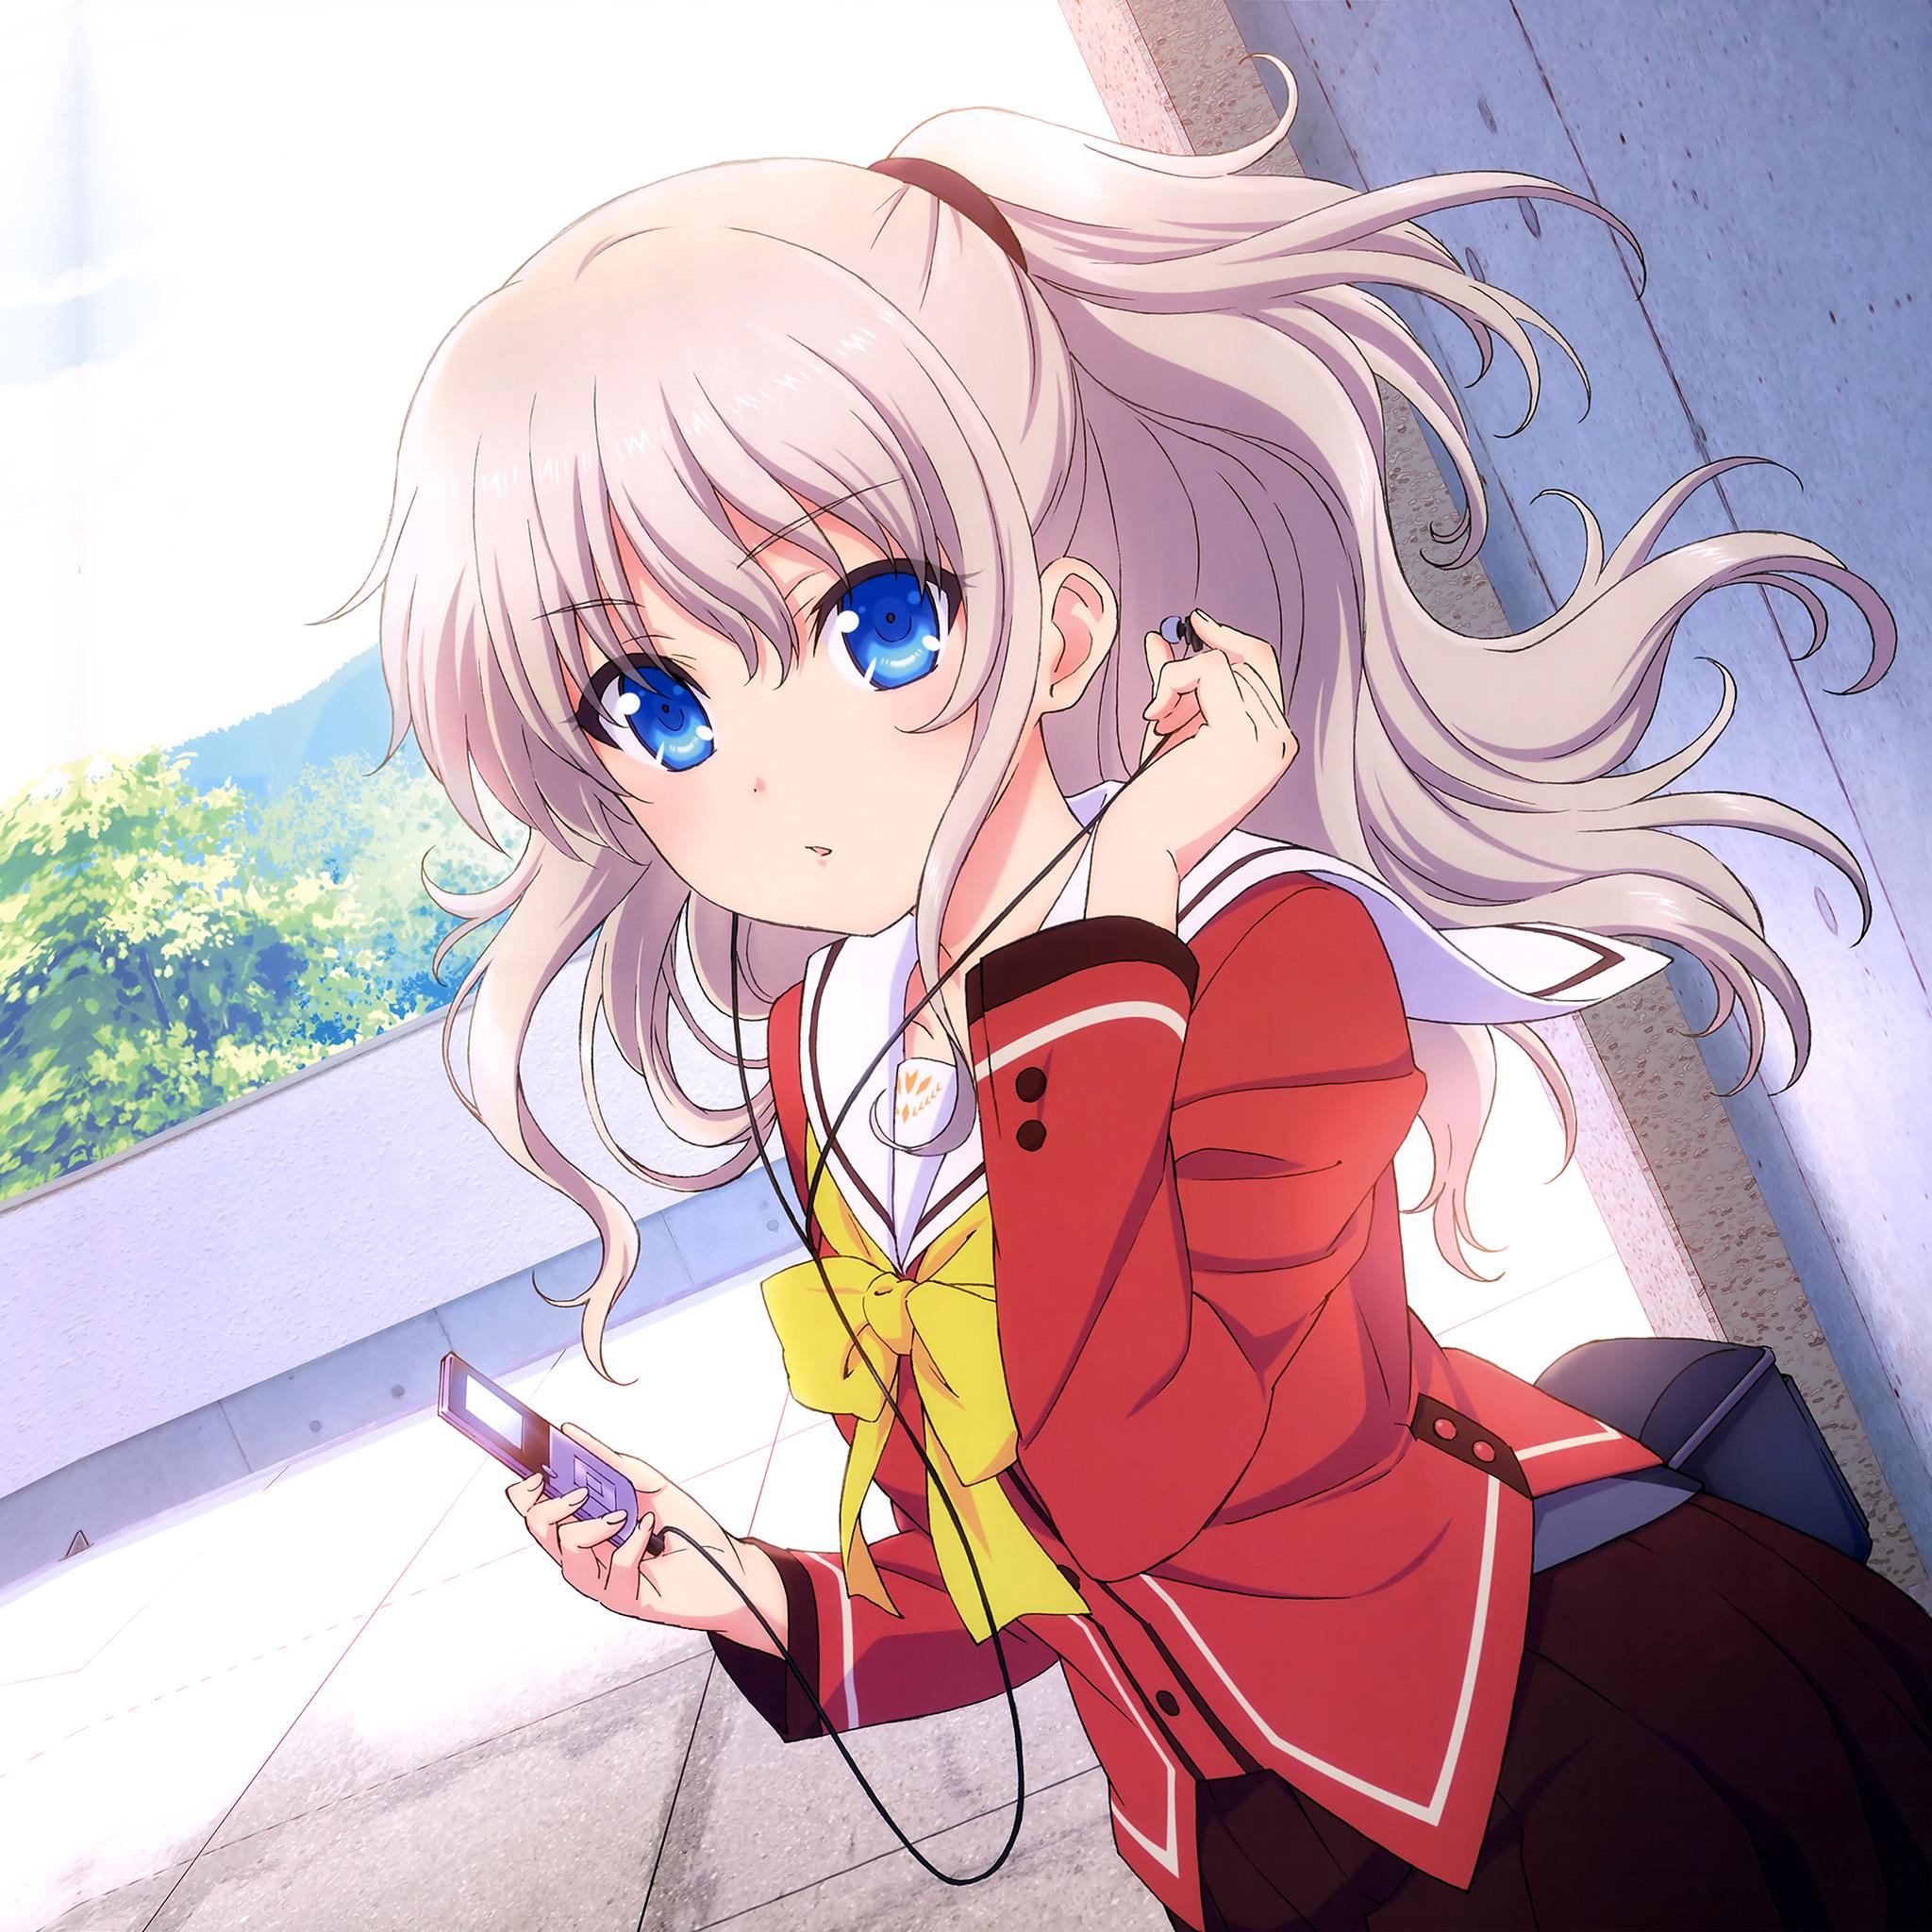 Cute Anime Wallpapers: Aq87-chalorette-anime-girl-cute-art-illustration-wallpaper